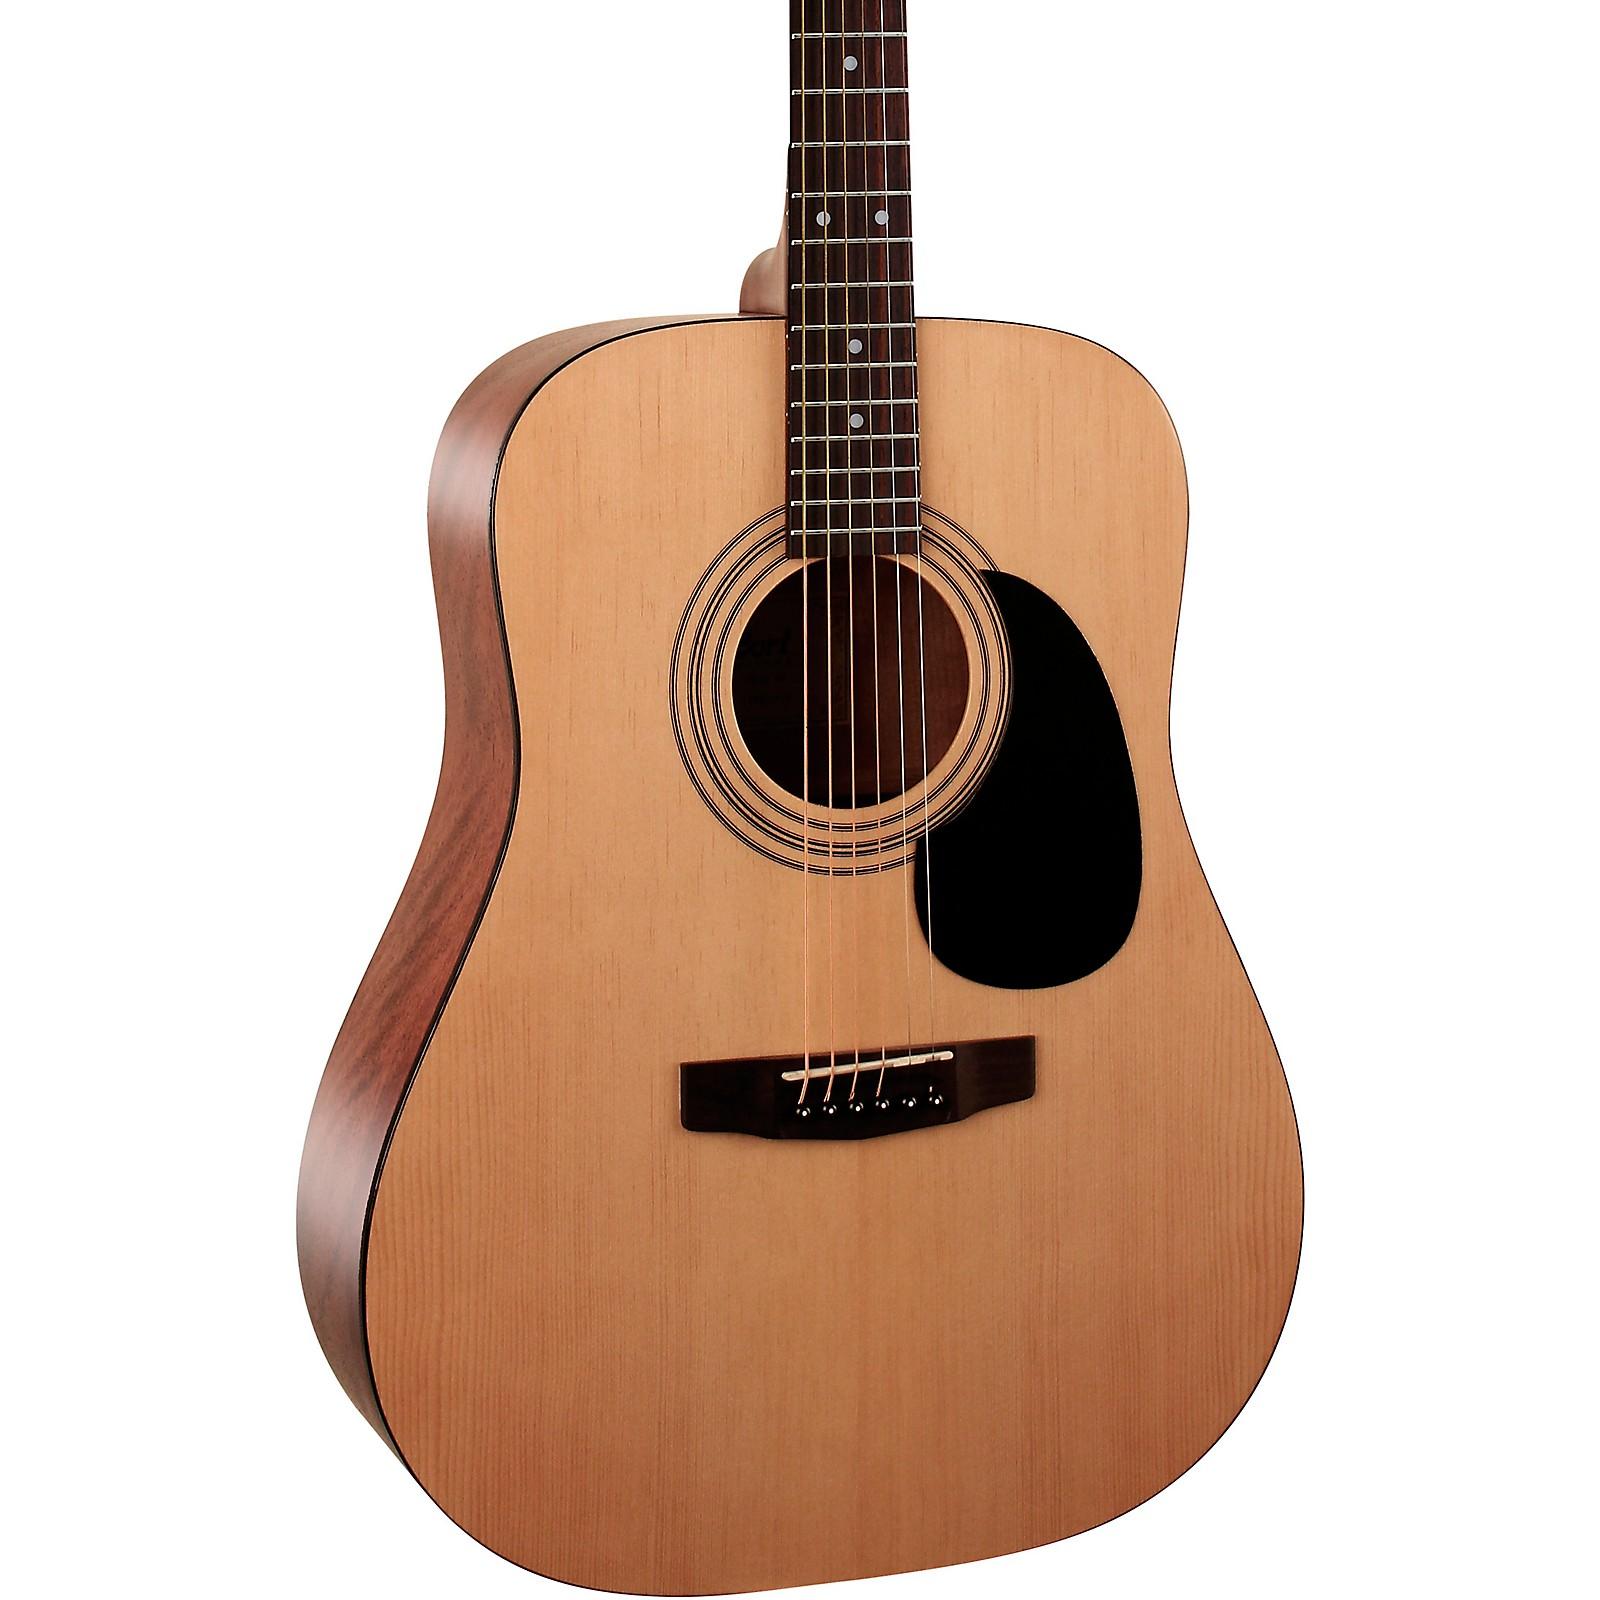 Cort AD810 OP Dreadnought Acoustic Guitar